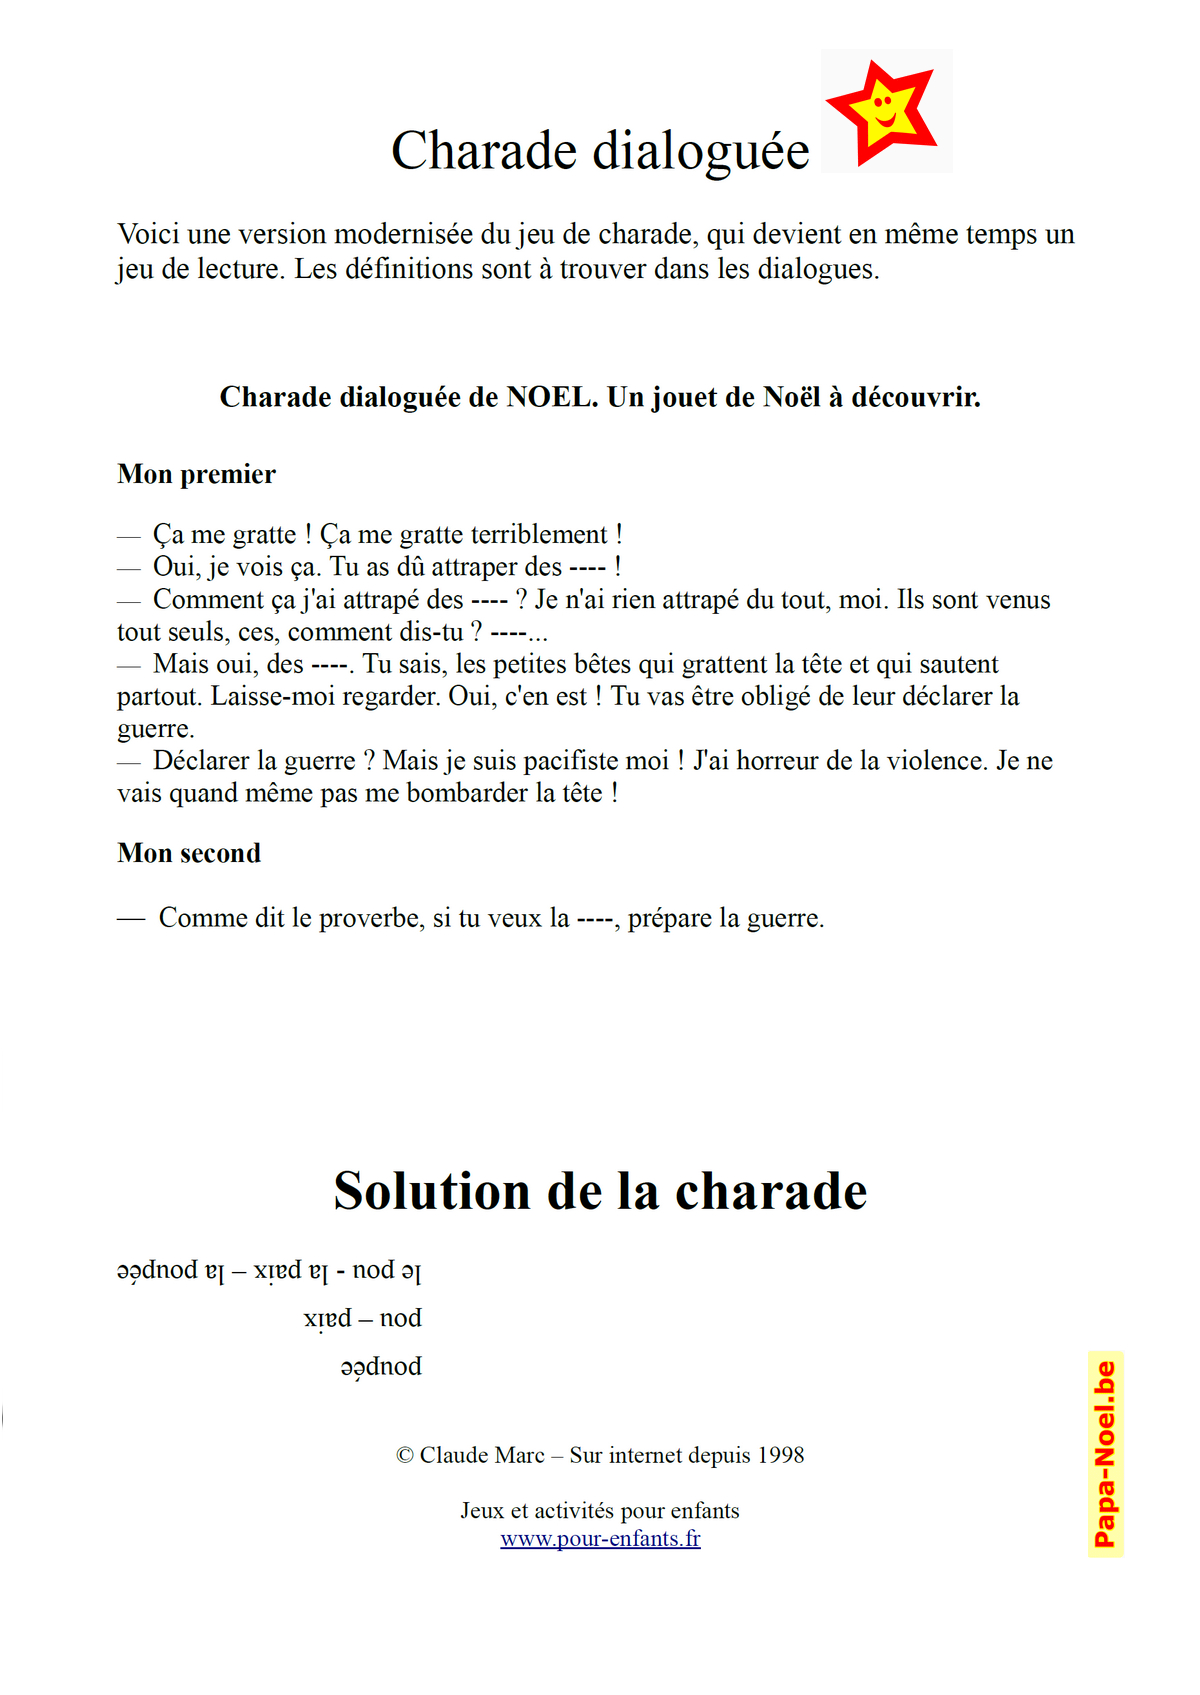 Charades De Noel Archives - Charades, Jeux, Blagues tout Charade A Imprimer